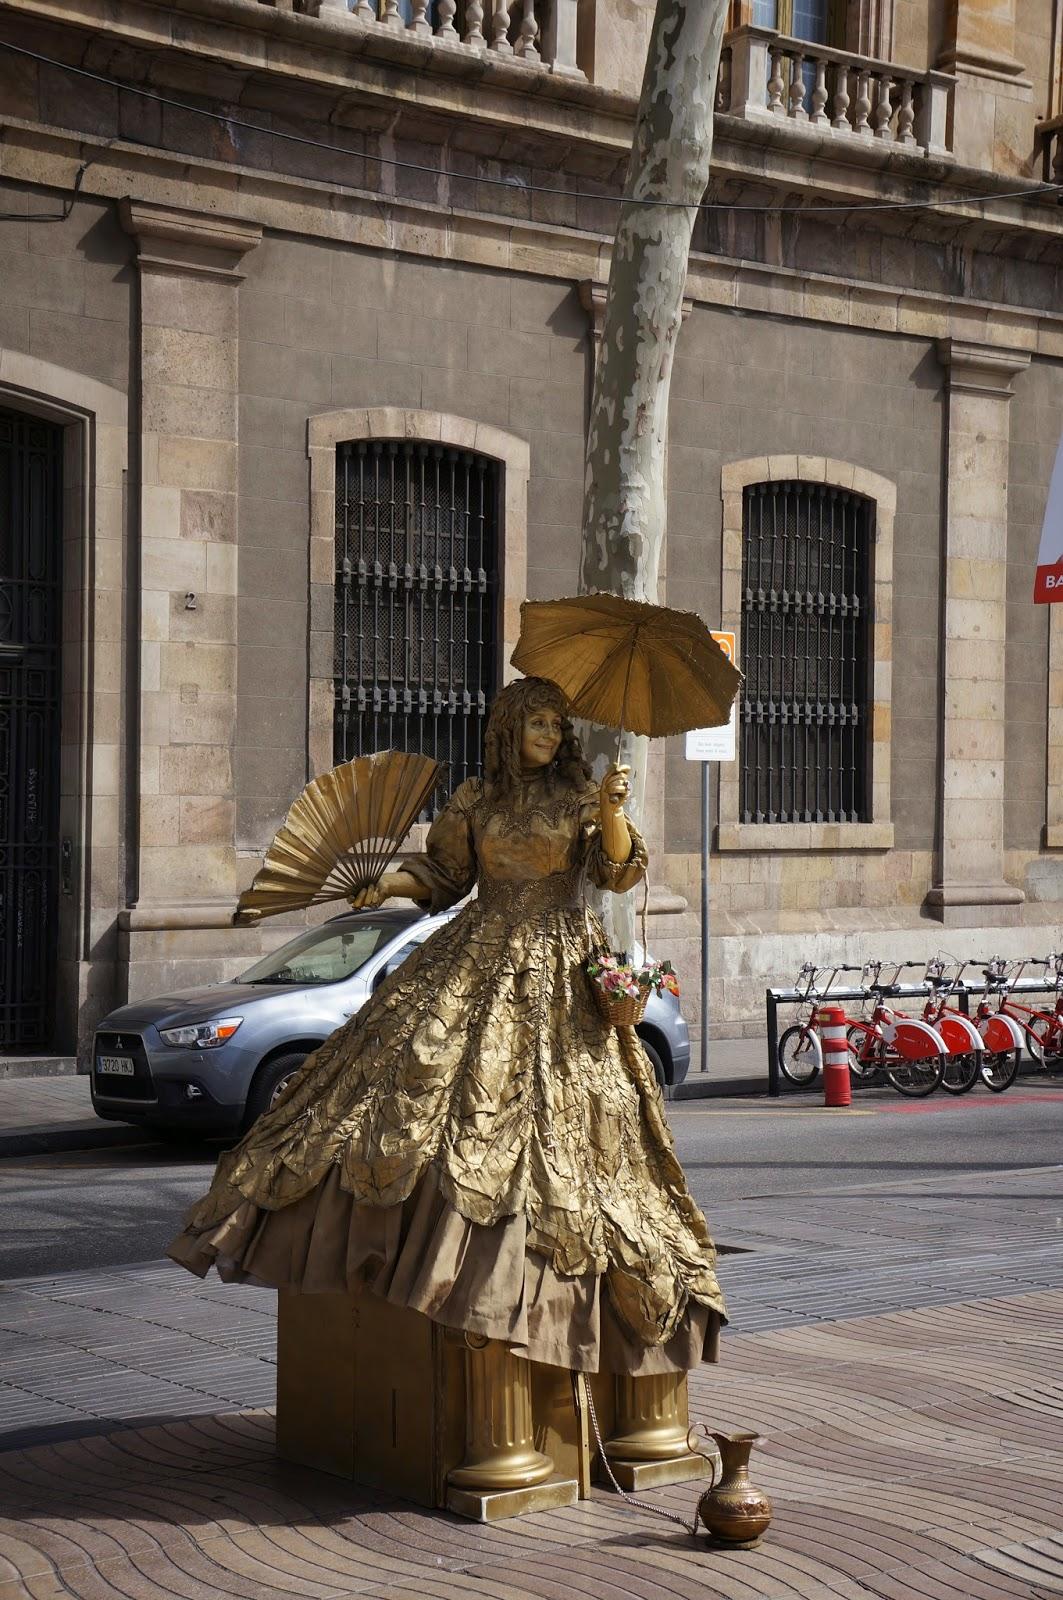 Human statue in gold, Las Ramblas district of Barcelona Spain.